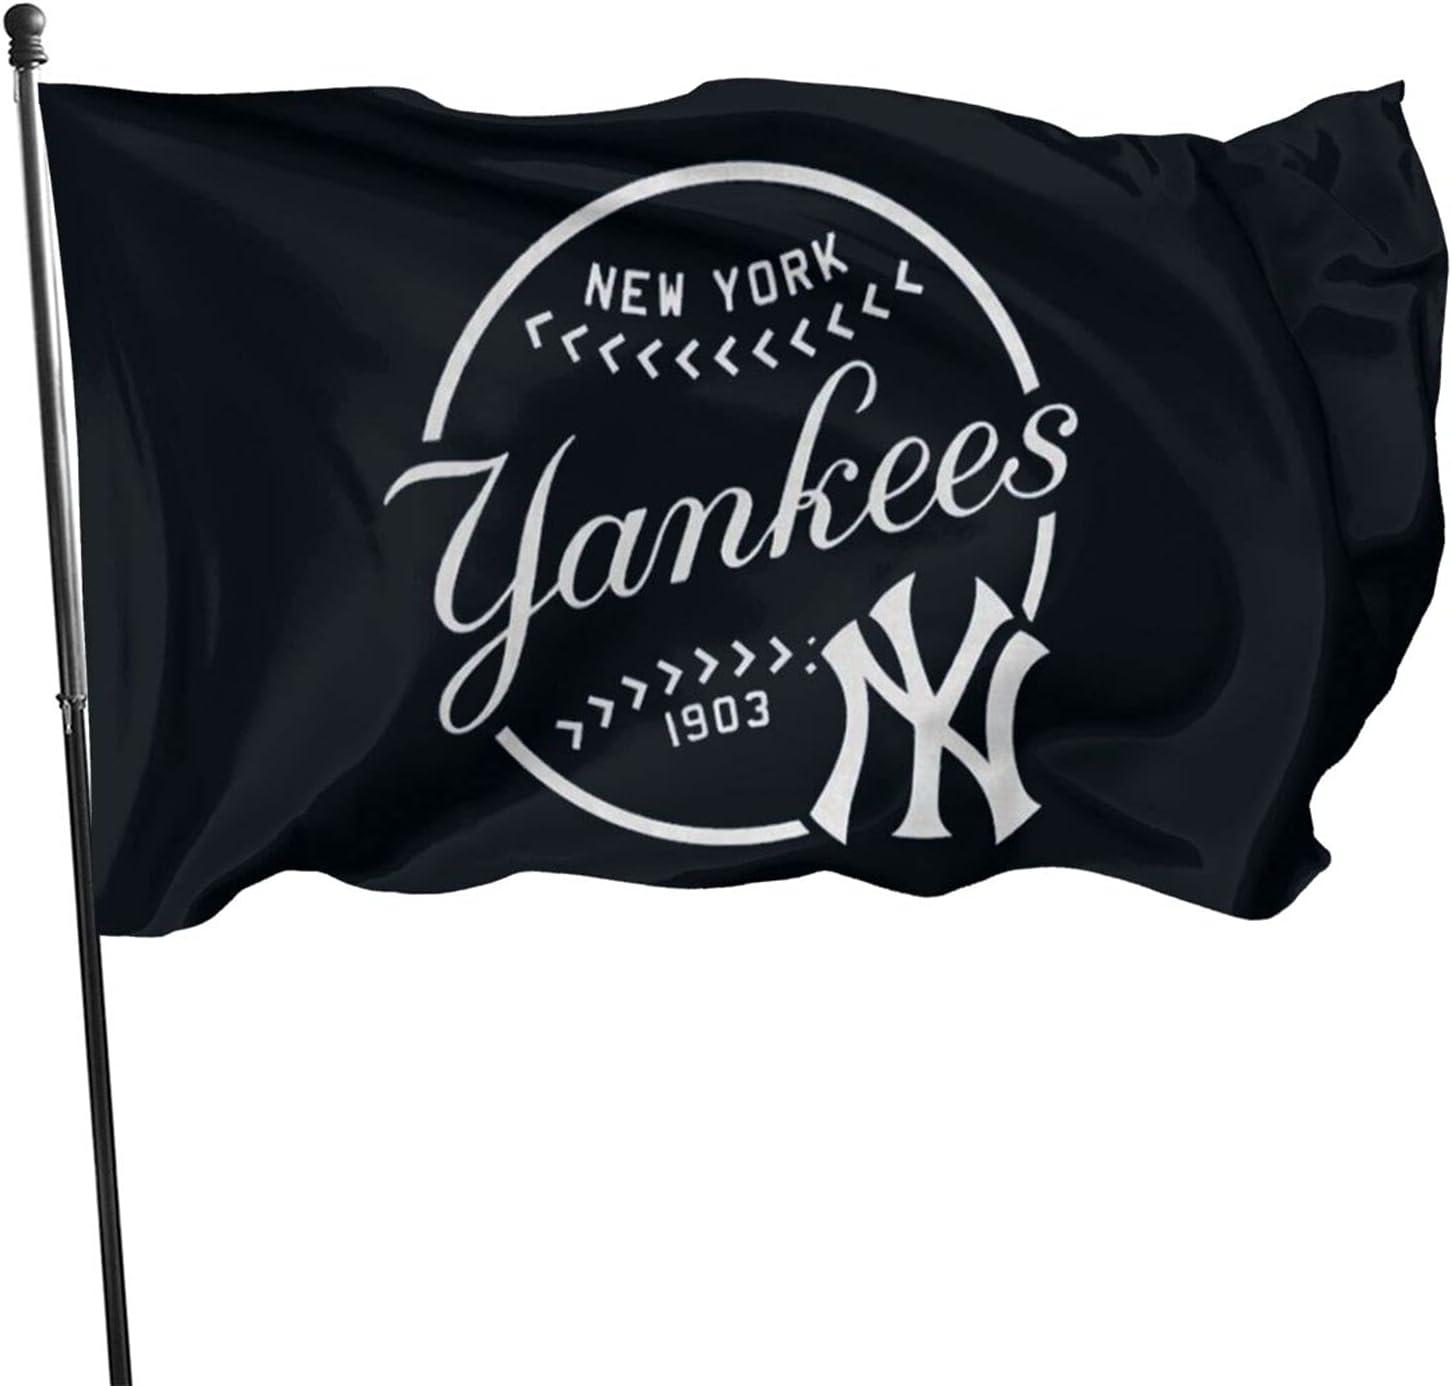 Voglawear New York Yankees Outdoor Flags 3x5 Foot Garden Decoration Durable Big Banner Flag